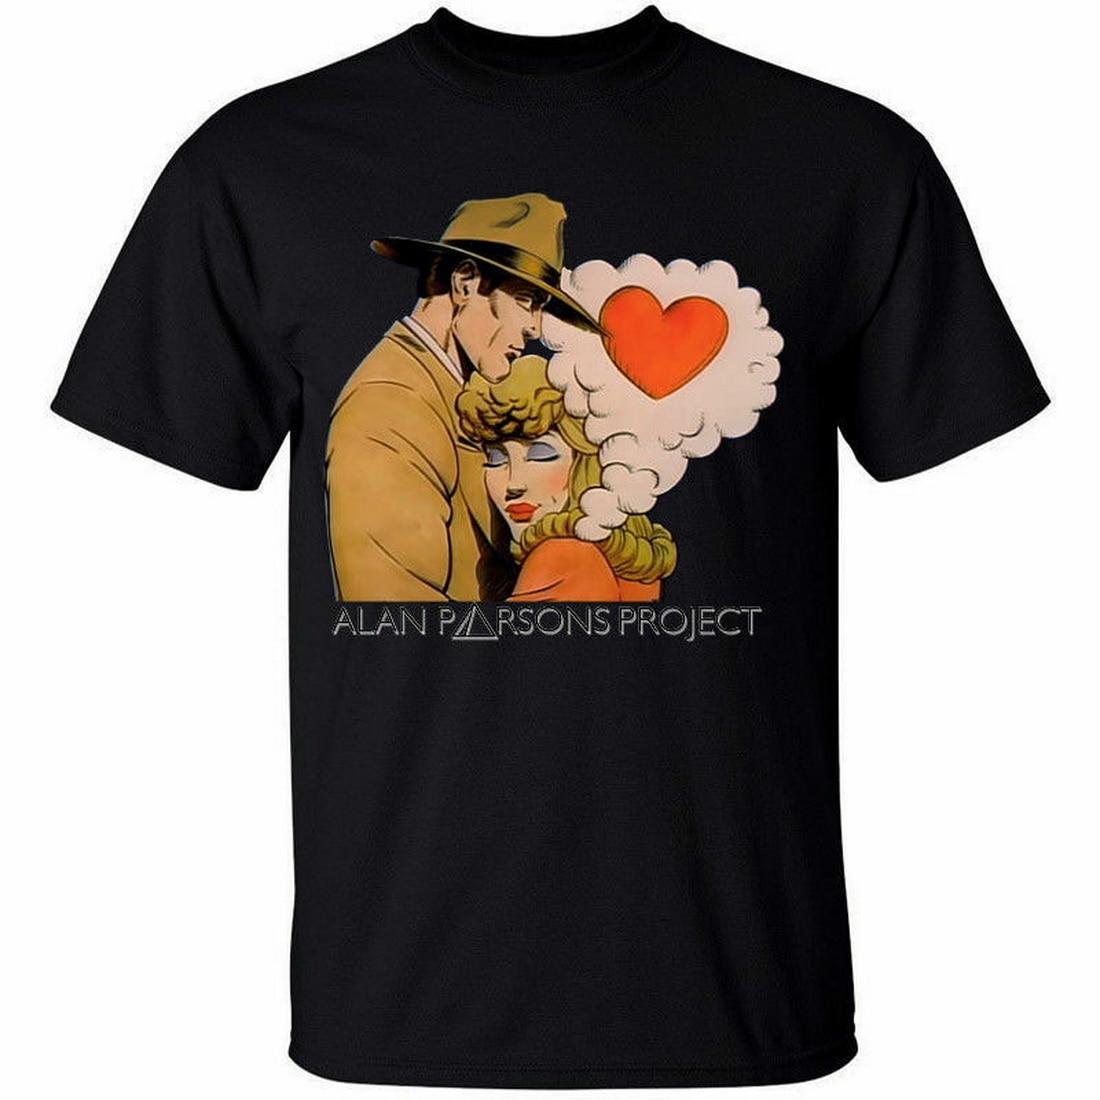 Camiseta con gráfico de Alan Parsons Project Don't Answer Me, camiseta de...